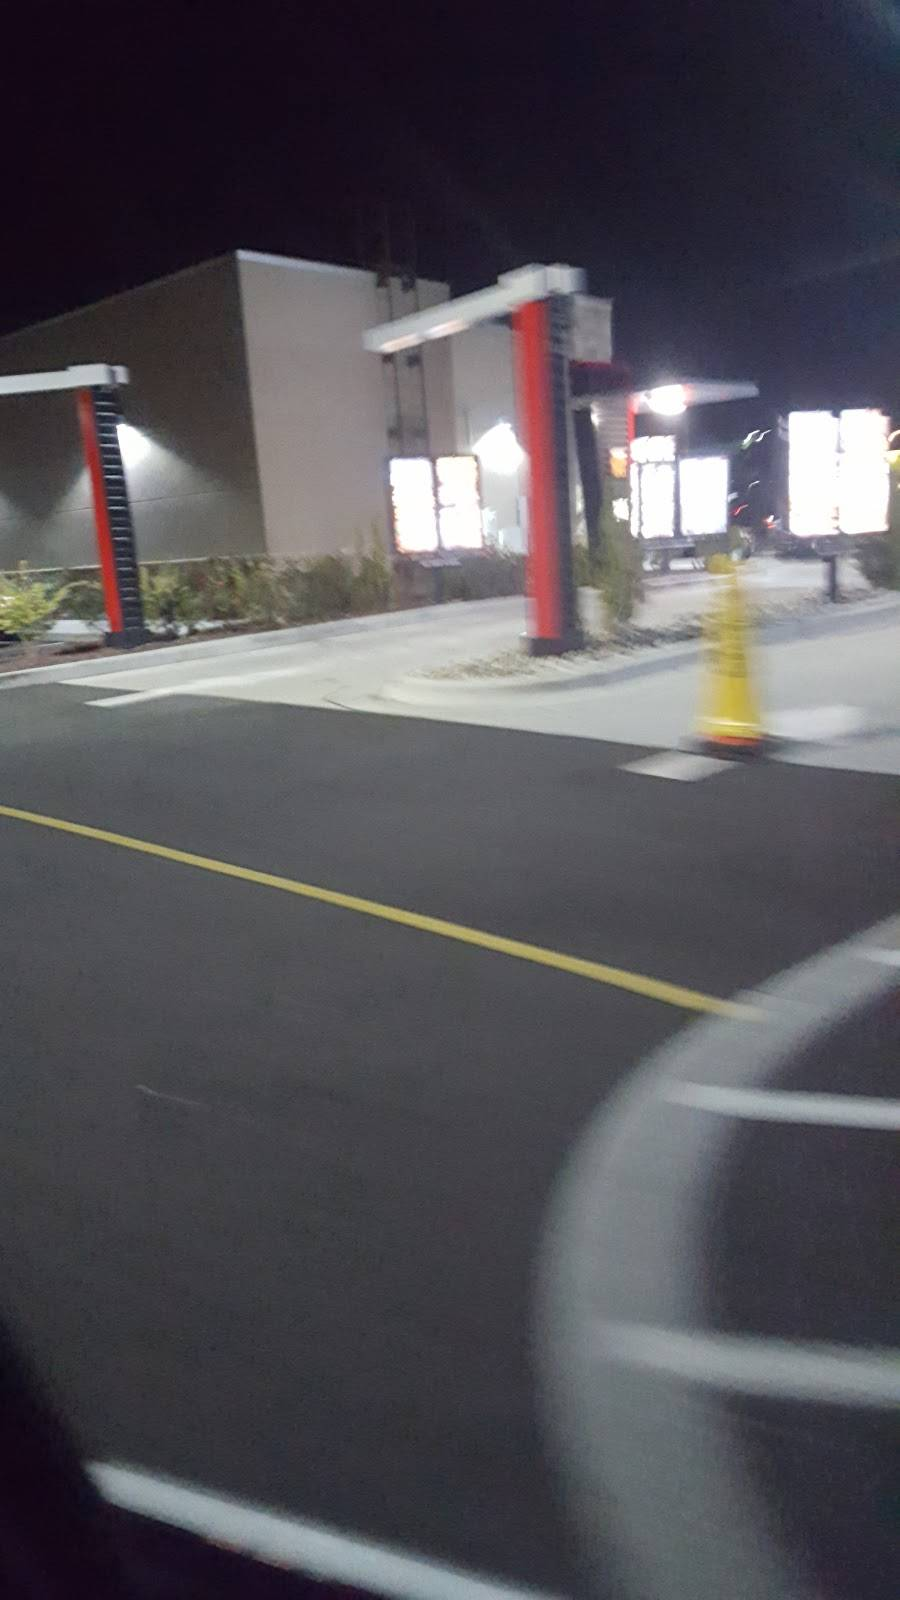 Burger King | restaurant | 2714 N Salisbury Blvd, Salisbury, MD 21801, USA | 4105465919 OR +1 410-546-5919